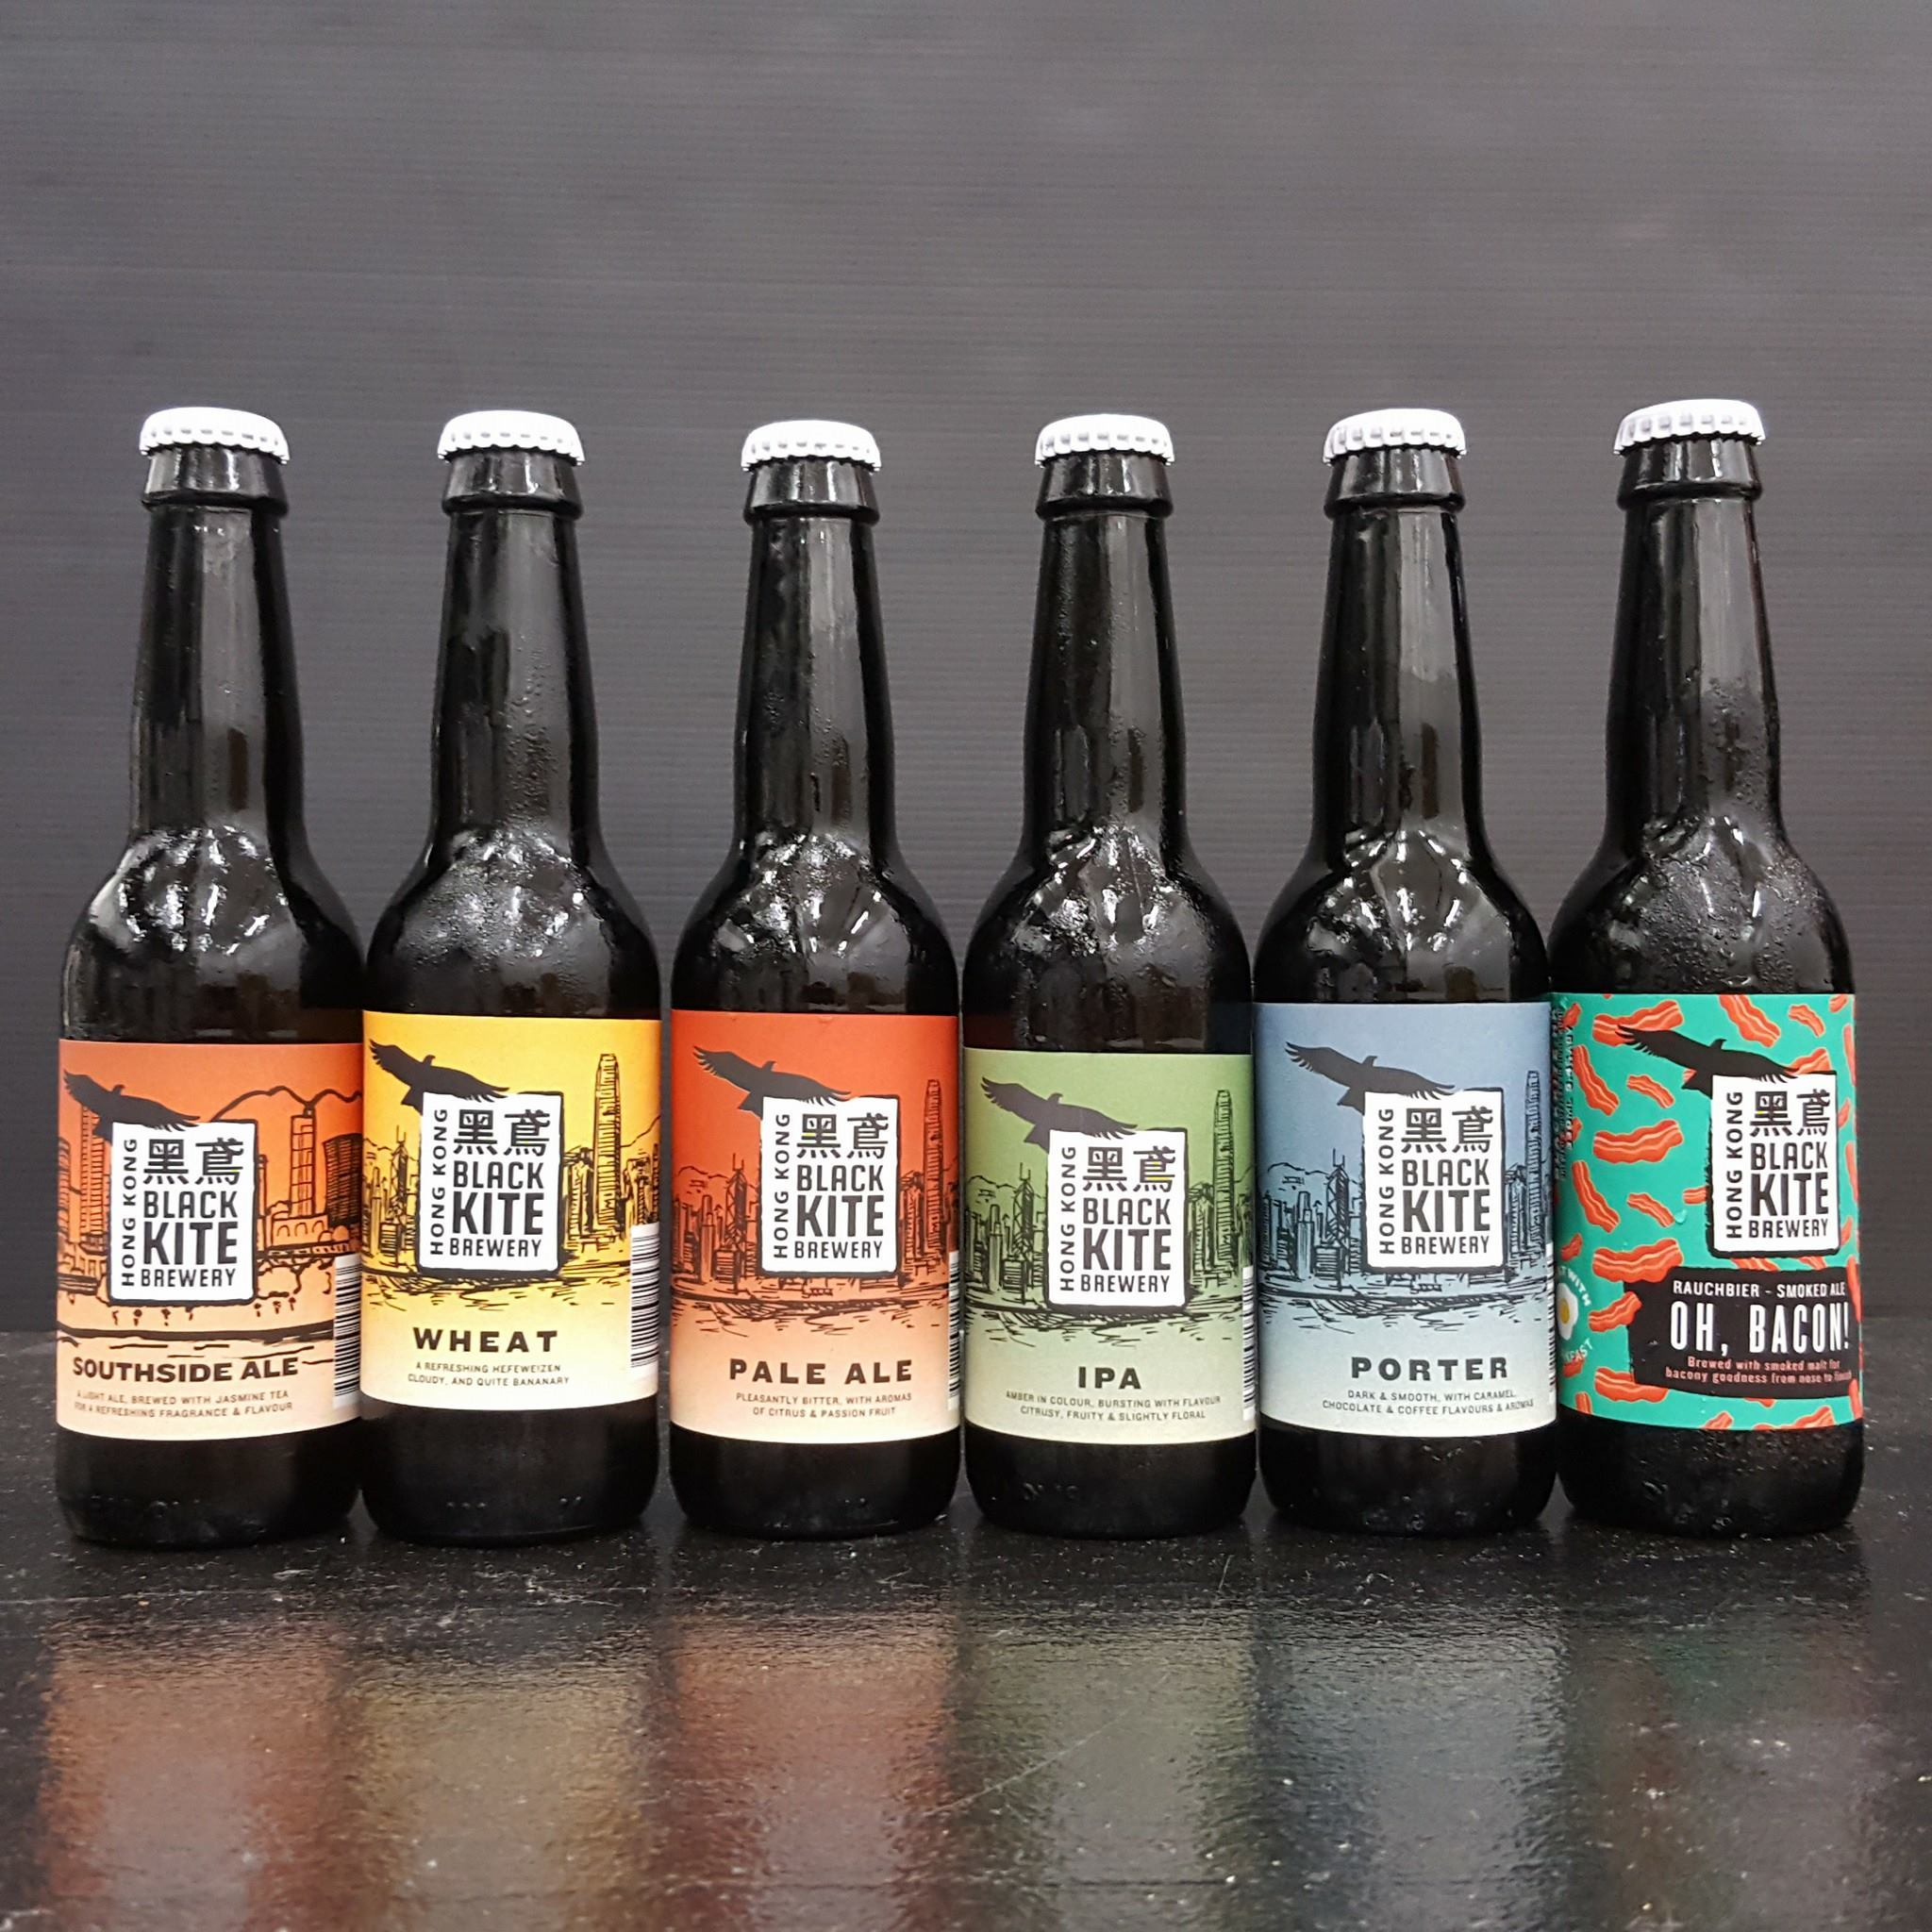 Black Kite Brewery